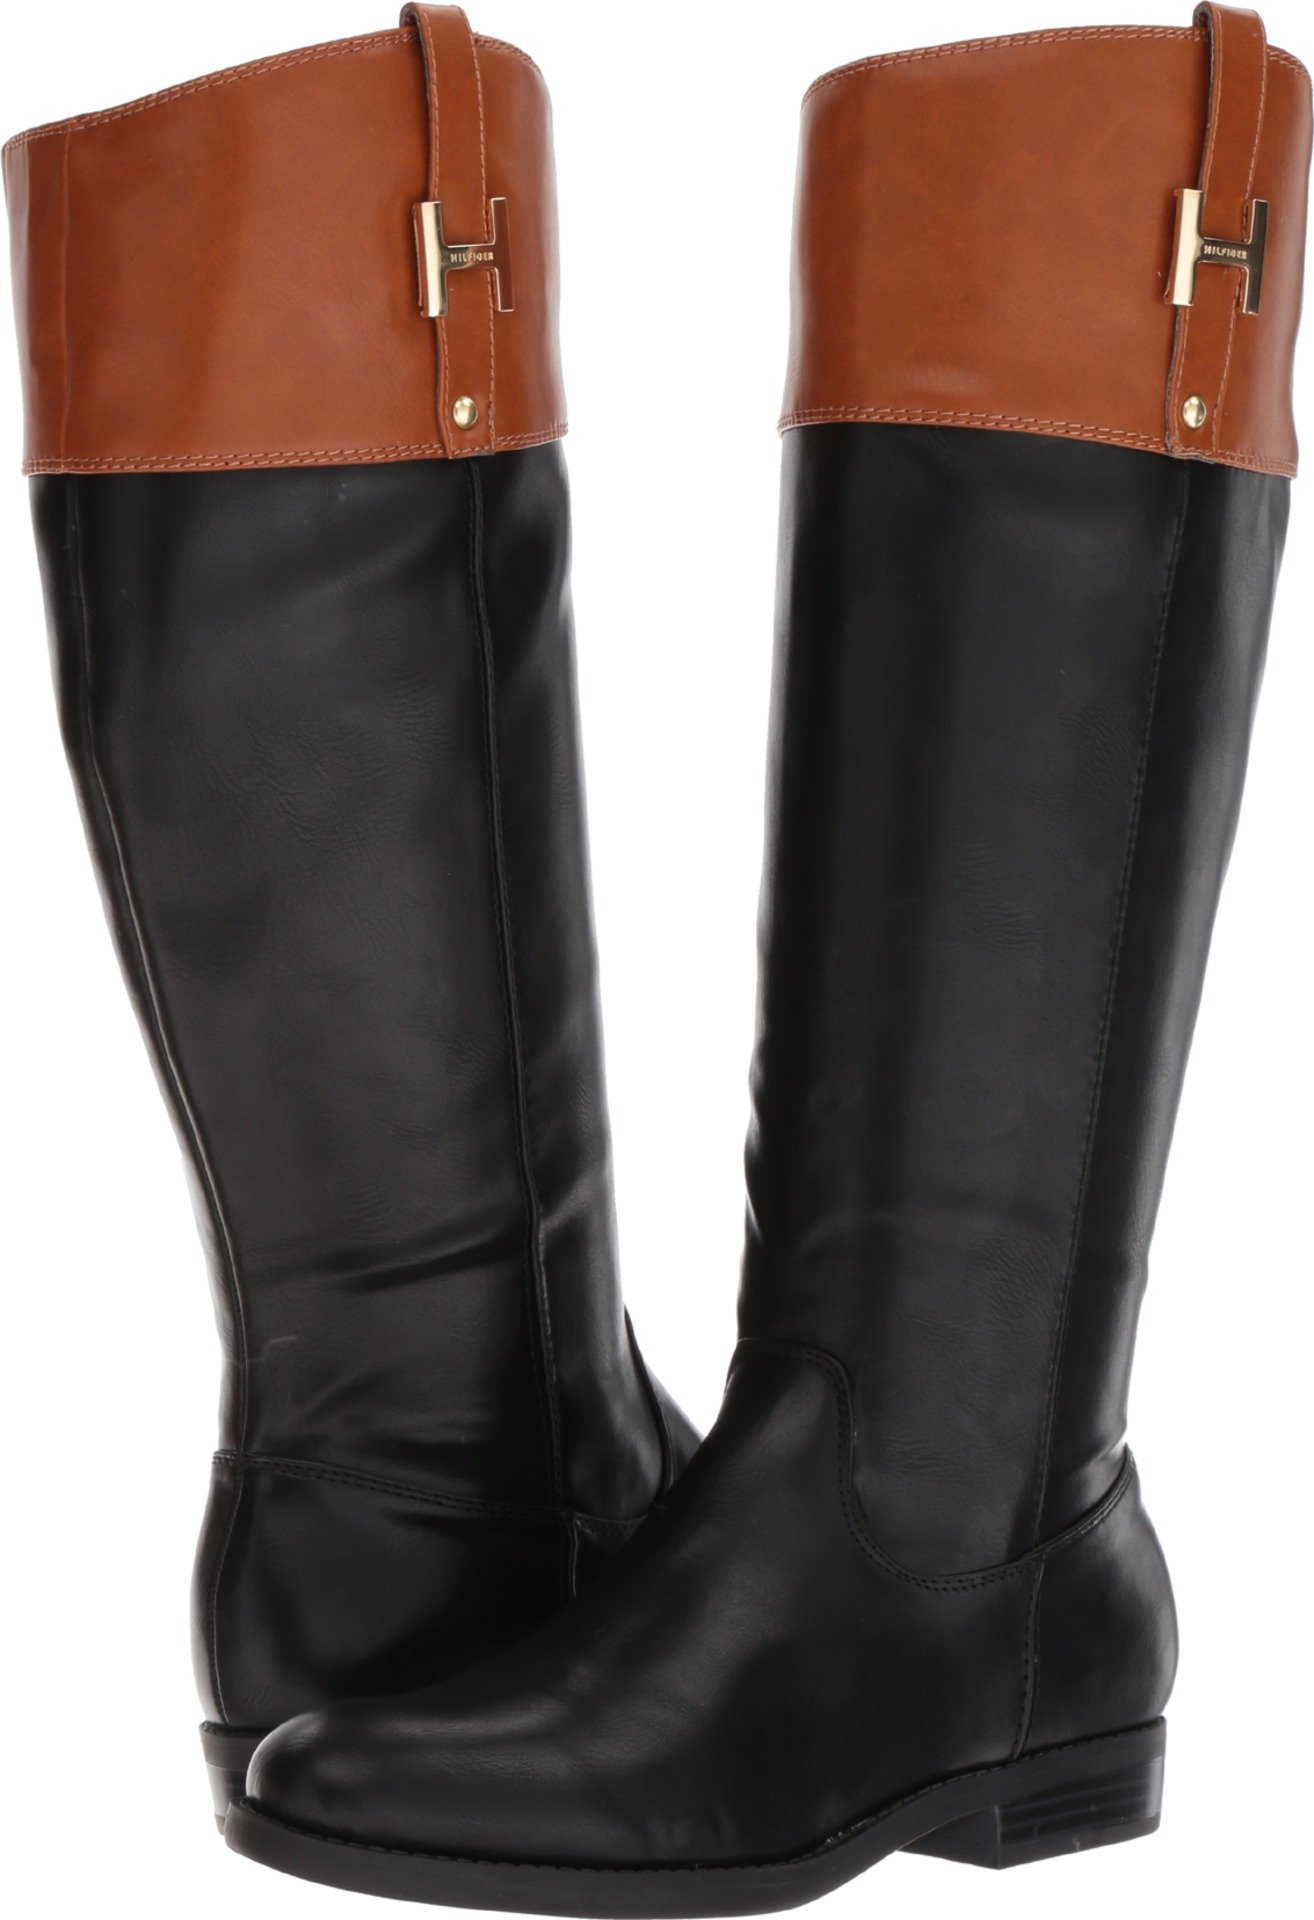 Tommy Hilfiger Women's Shyenne Equestrian Boot, Black/Cognac, 8.5 Medium US